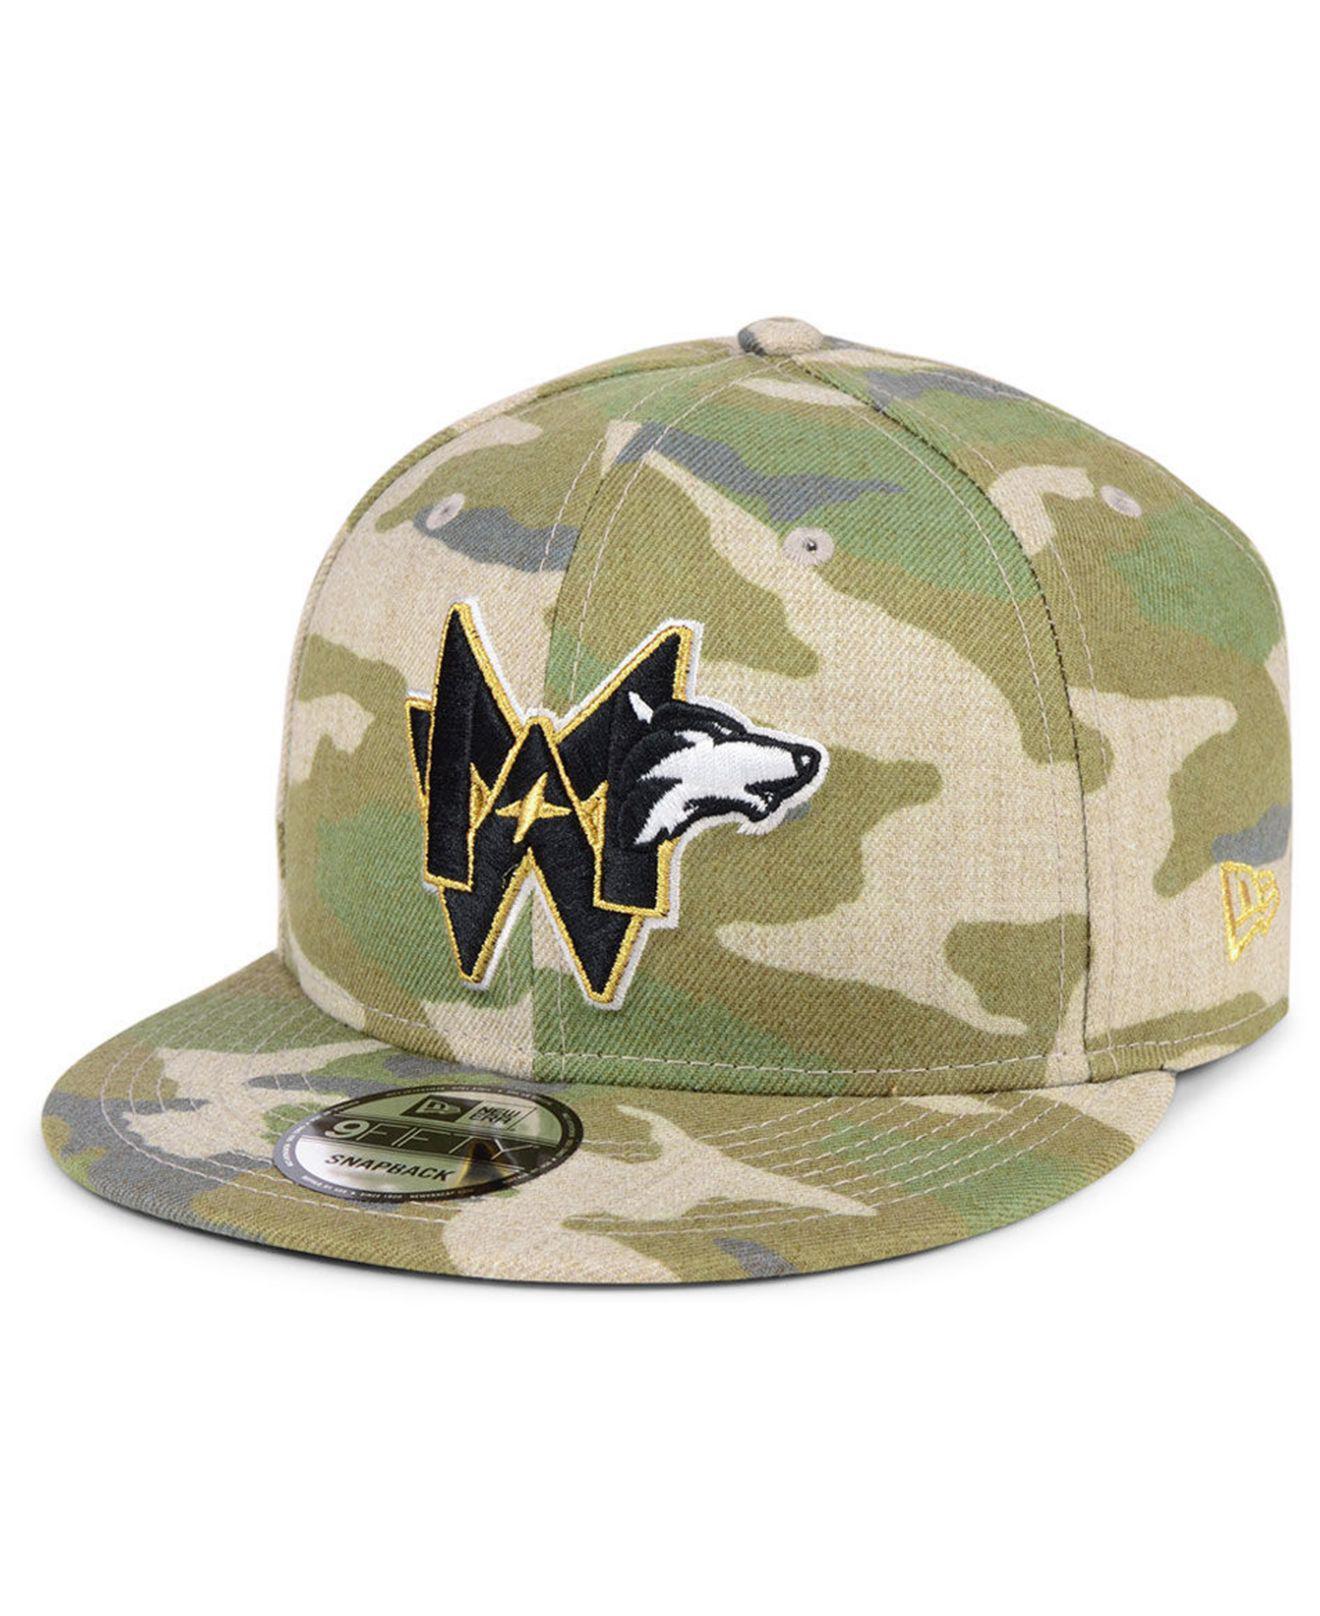 half off 65f16 1573f KTZ Minnesota Timberwolves Combo Camo 9fifty Snapback Cap in Green ...